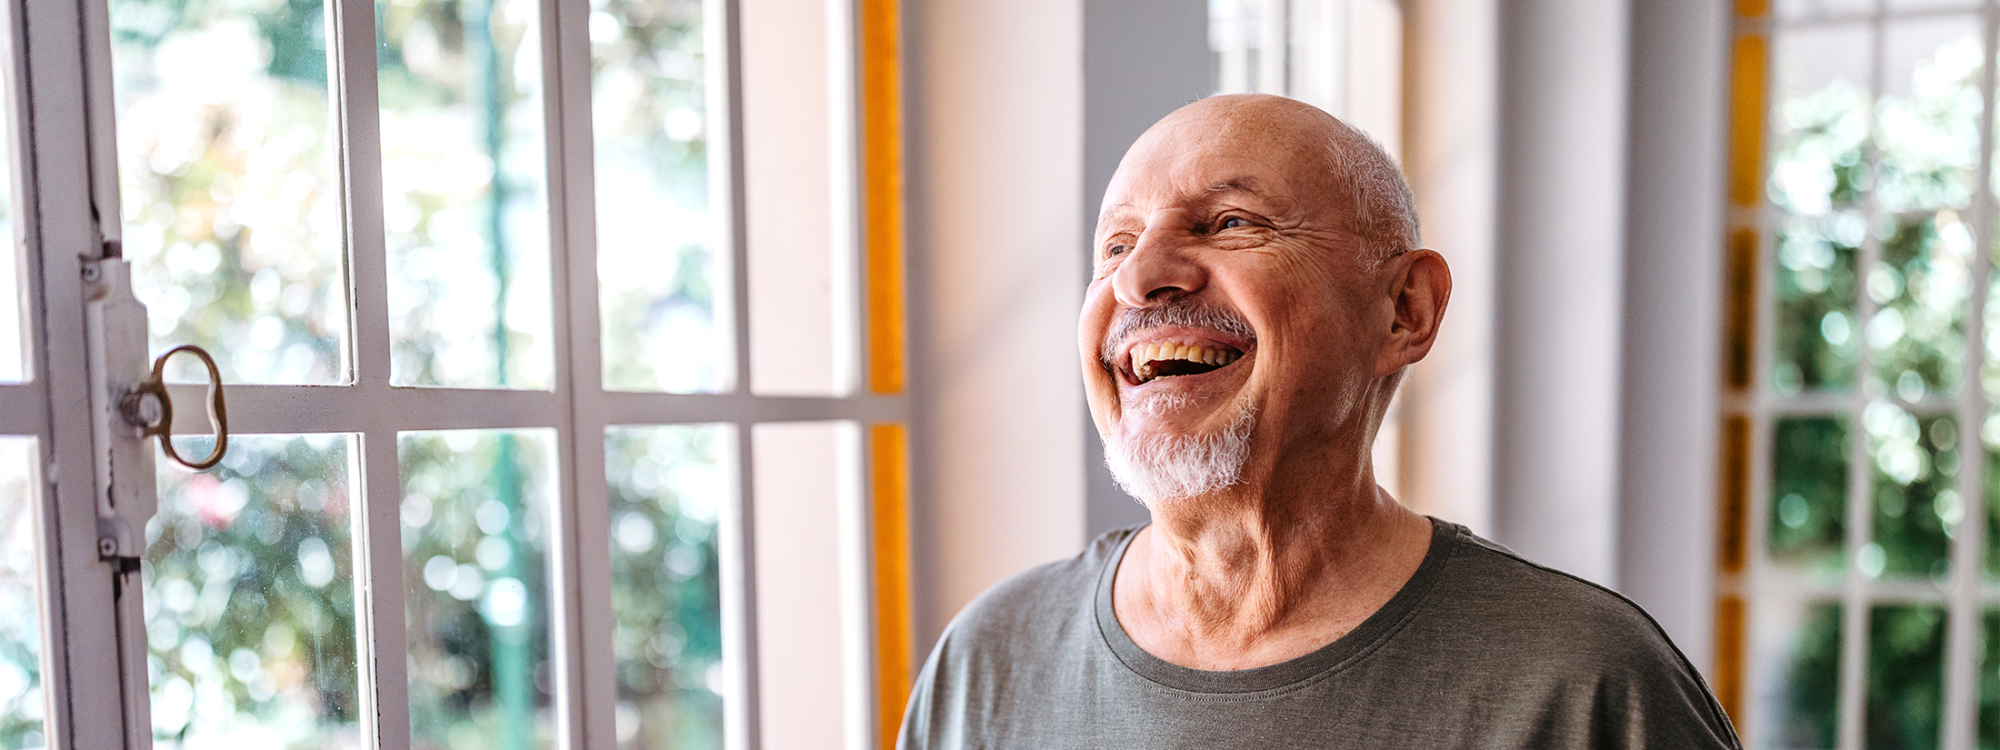 Milestone blog at Milestone Retirement Communities